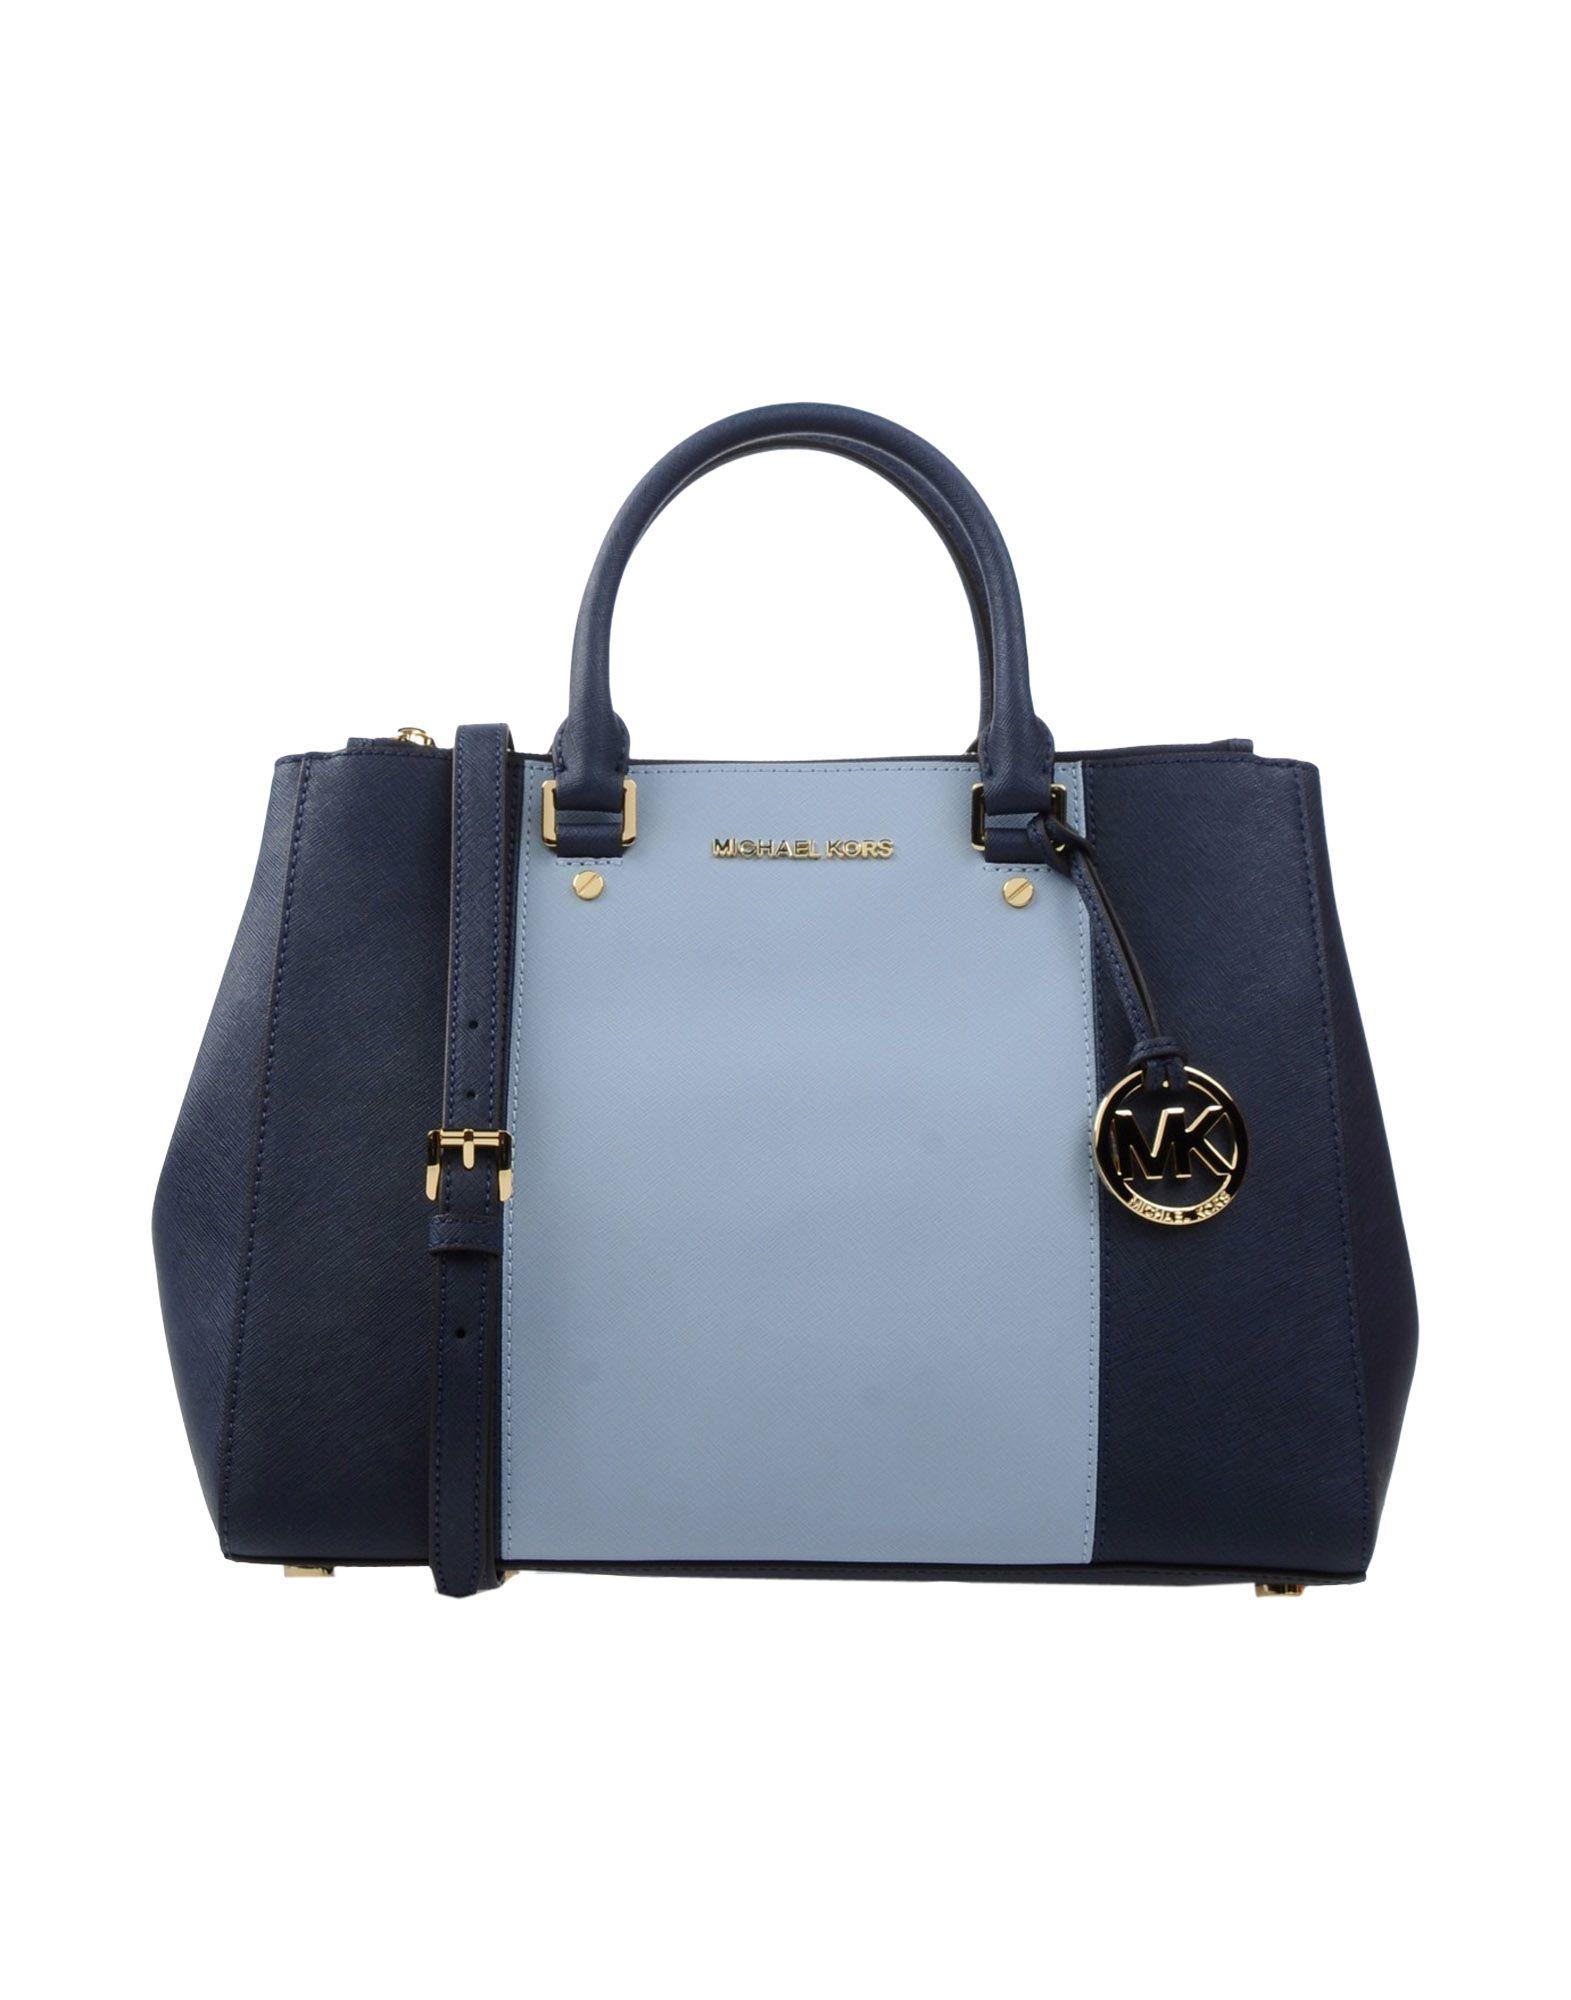 447c7ca43904 MICHAEL Michael Kors Handbag in Blue - Lyst